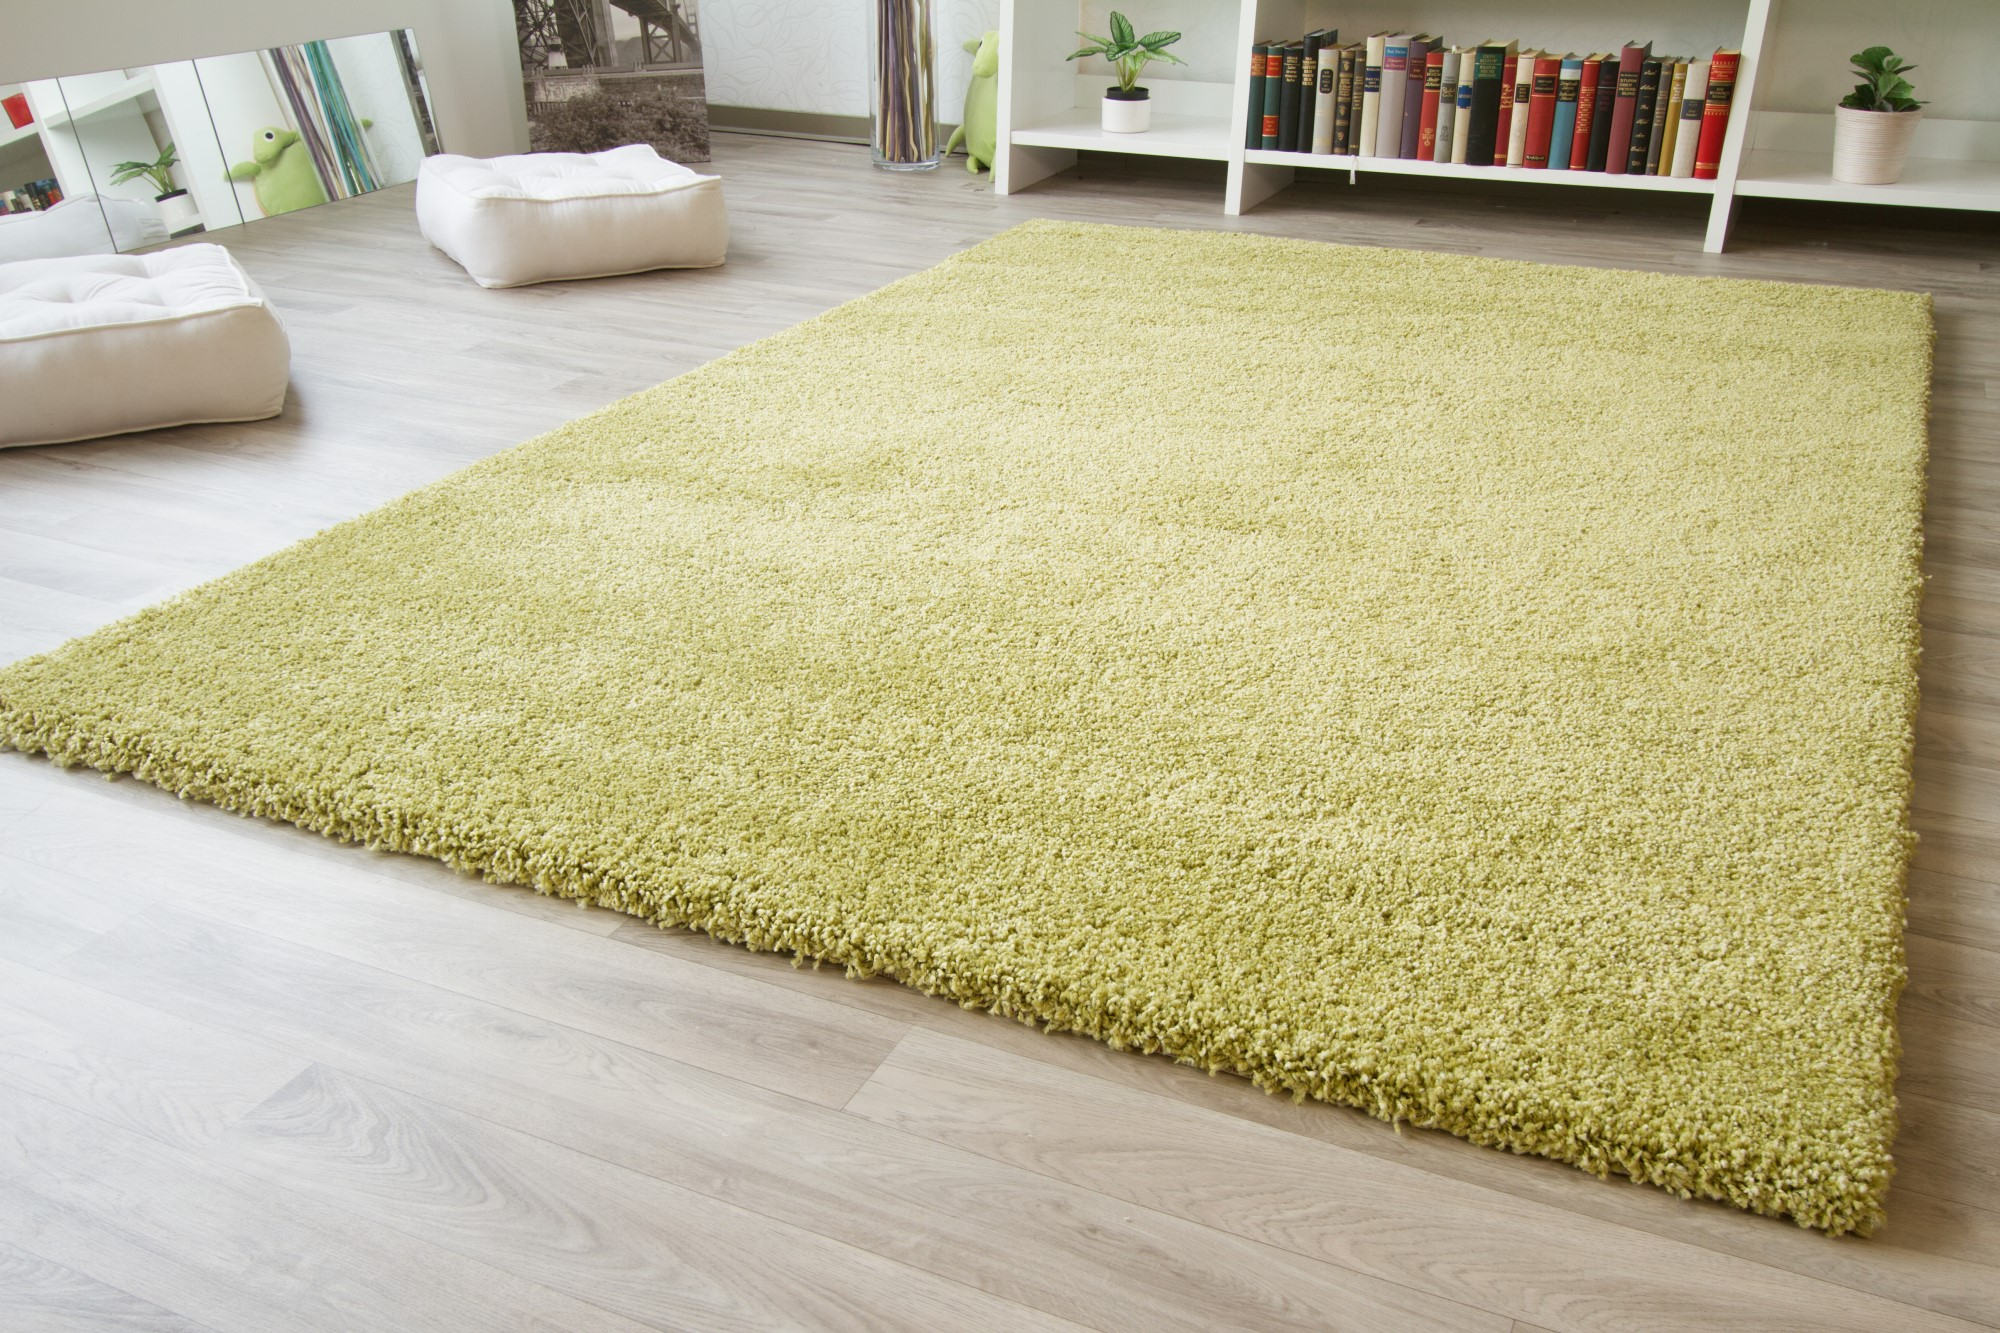 langflor hochflor teppich chamonix shaggy creme beige grau gr n braun rot t rkis ebay. Black Bedroom Furniture Sets. Home Design Ideas